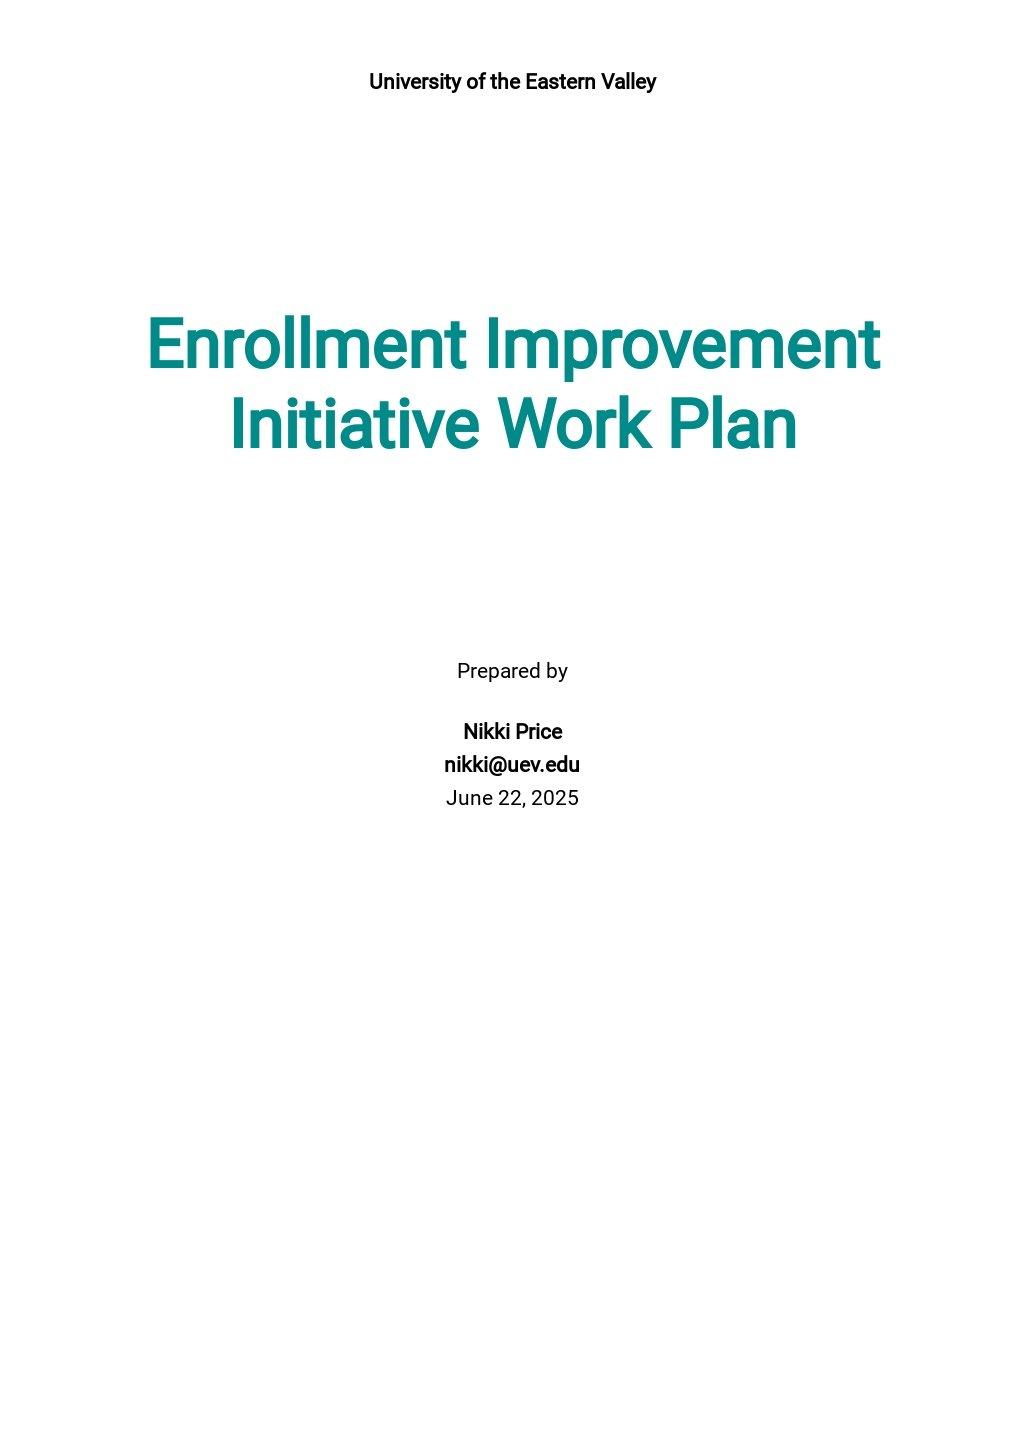 University Work Plan Template